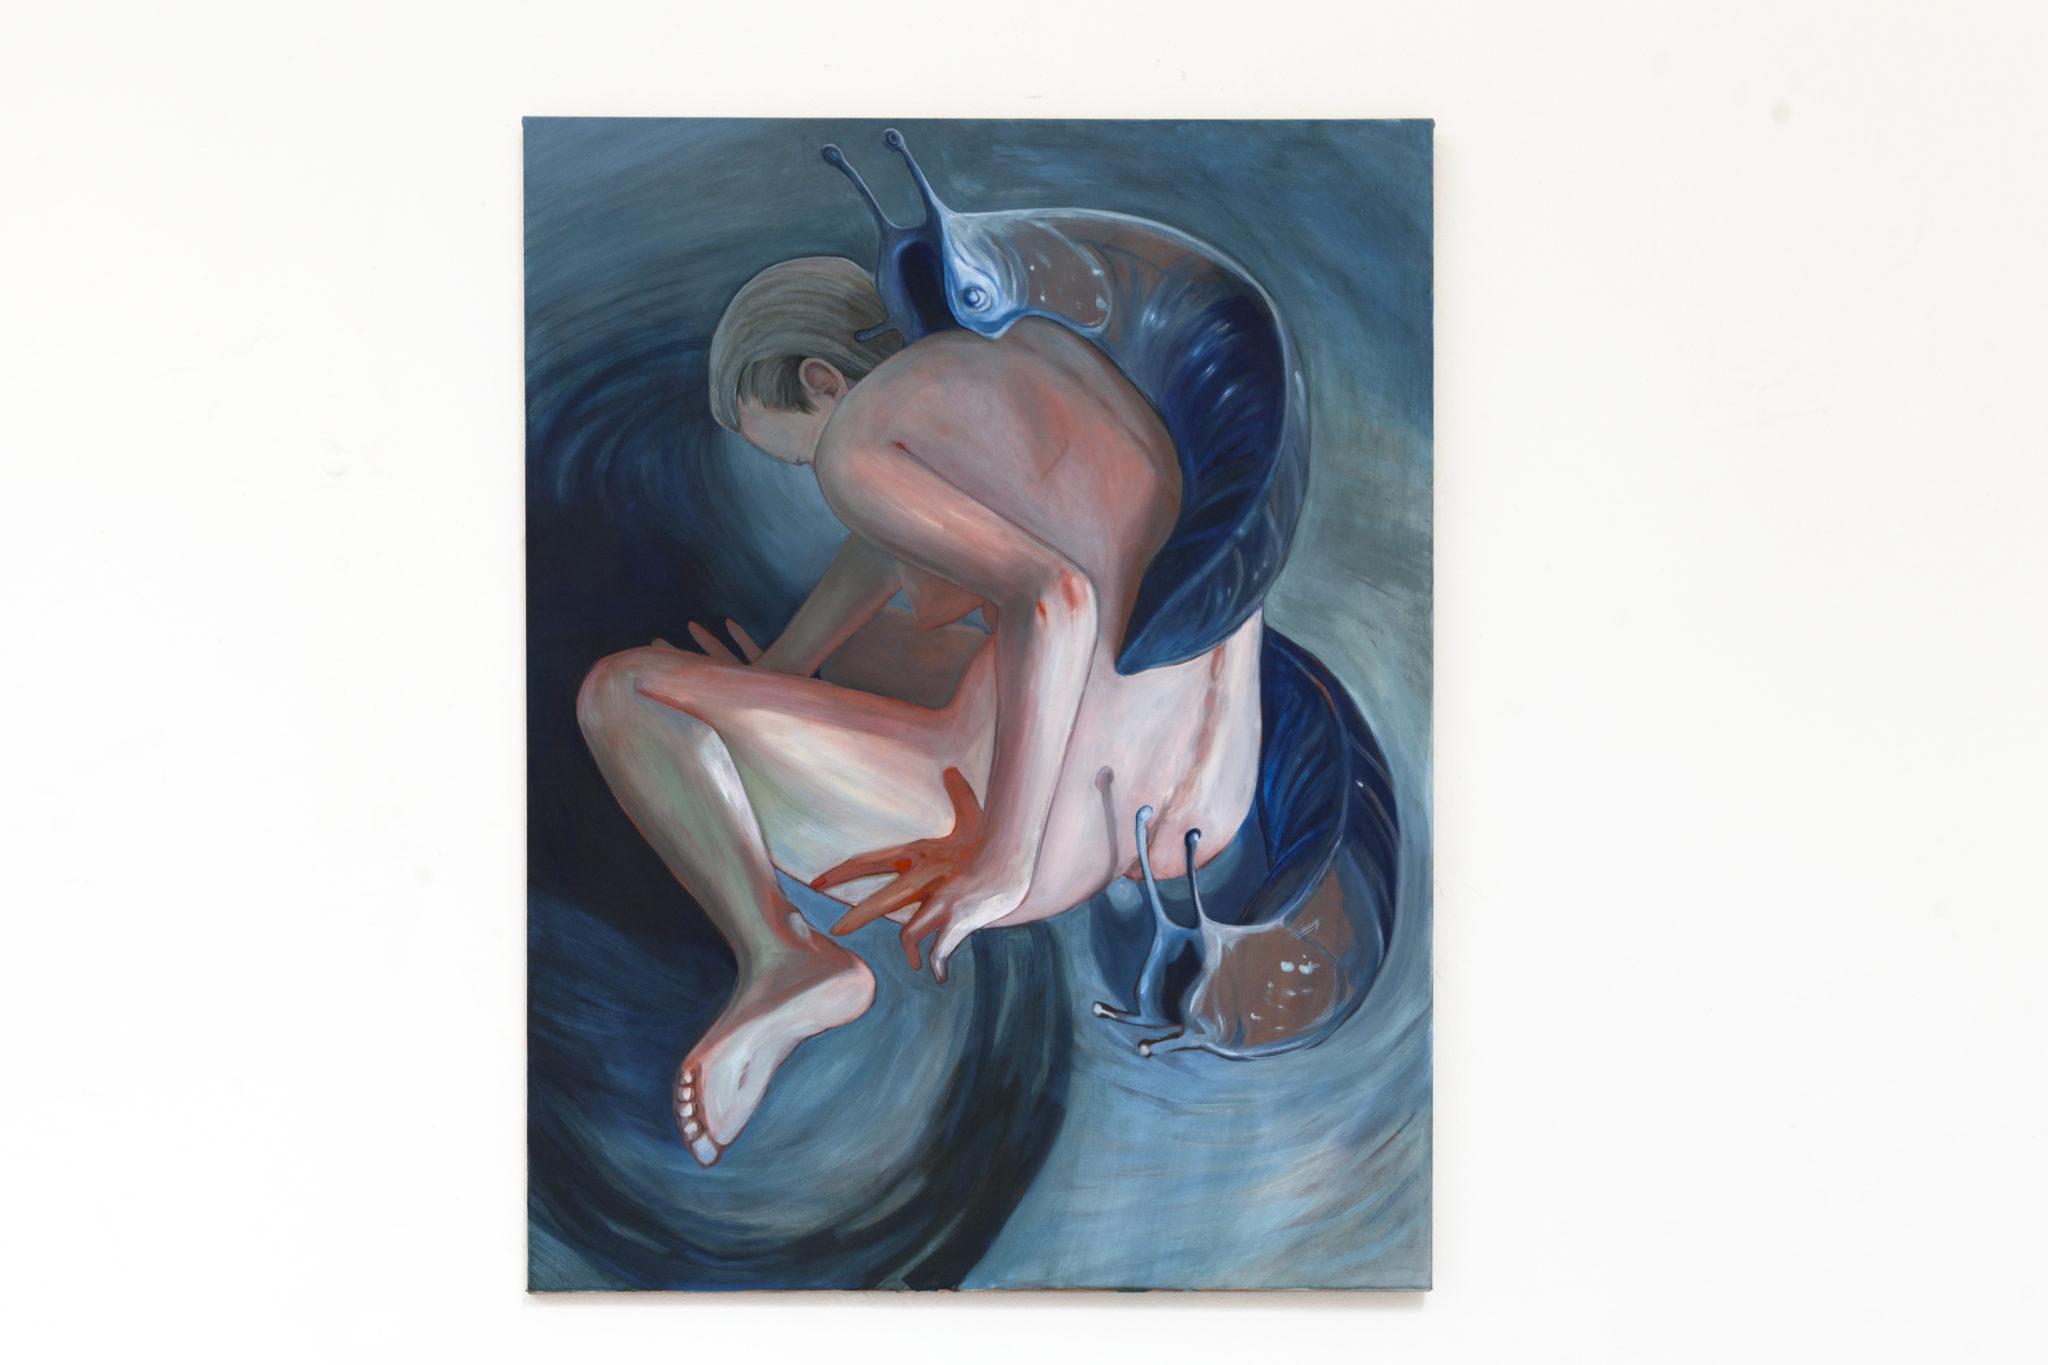 Franziska Dathe, Bedrängnis, Öl auf Leinwand, 130 x 100 x 2 cm, 2021